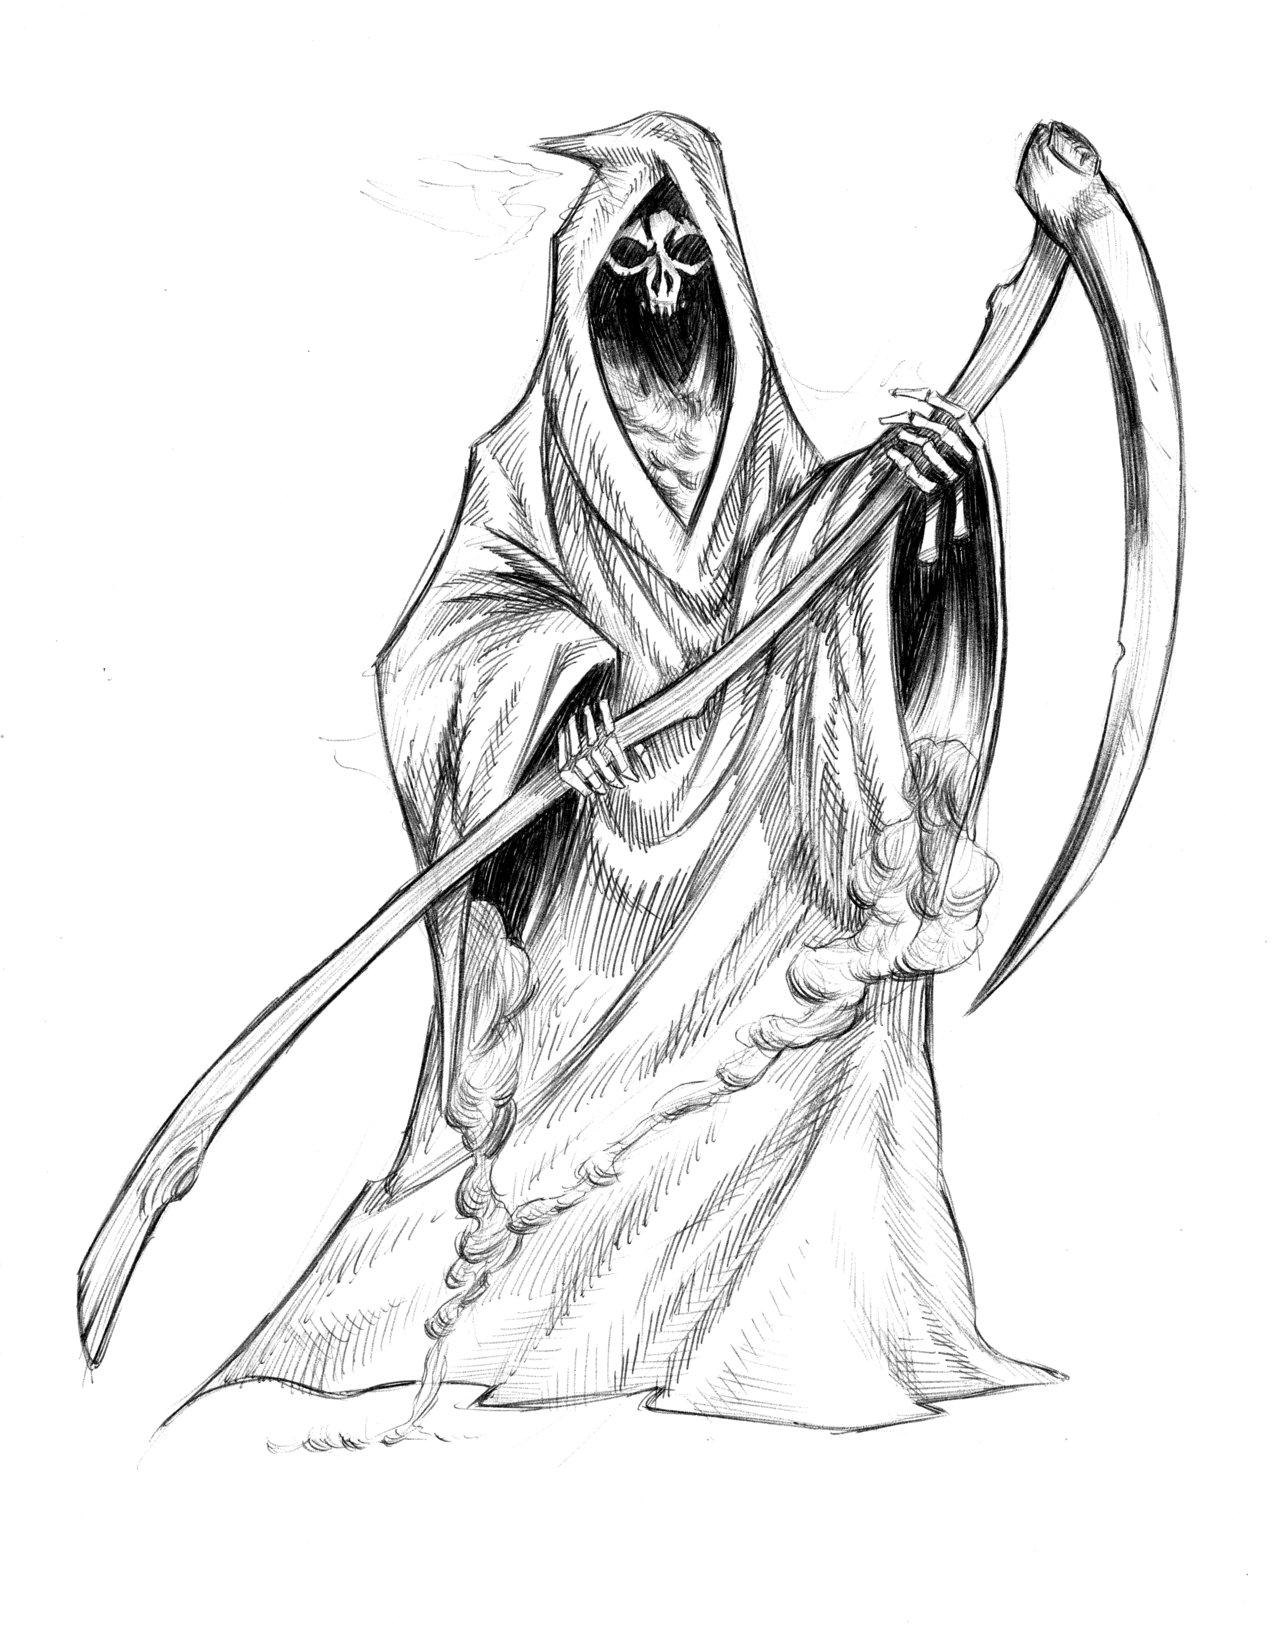 Drawn grim reaper detailed 1 Grim Grim 1 sketchbencky5